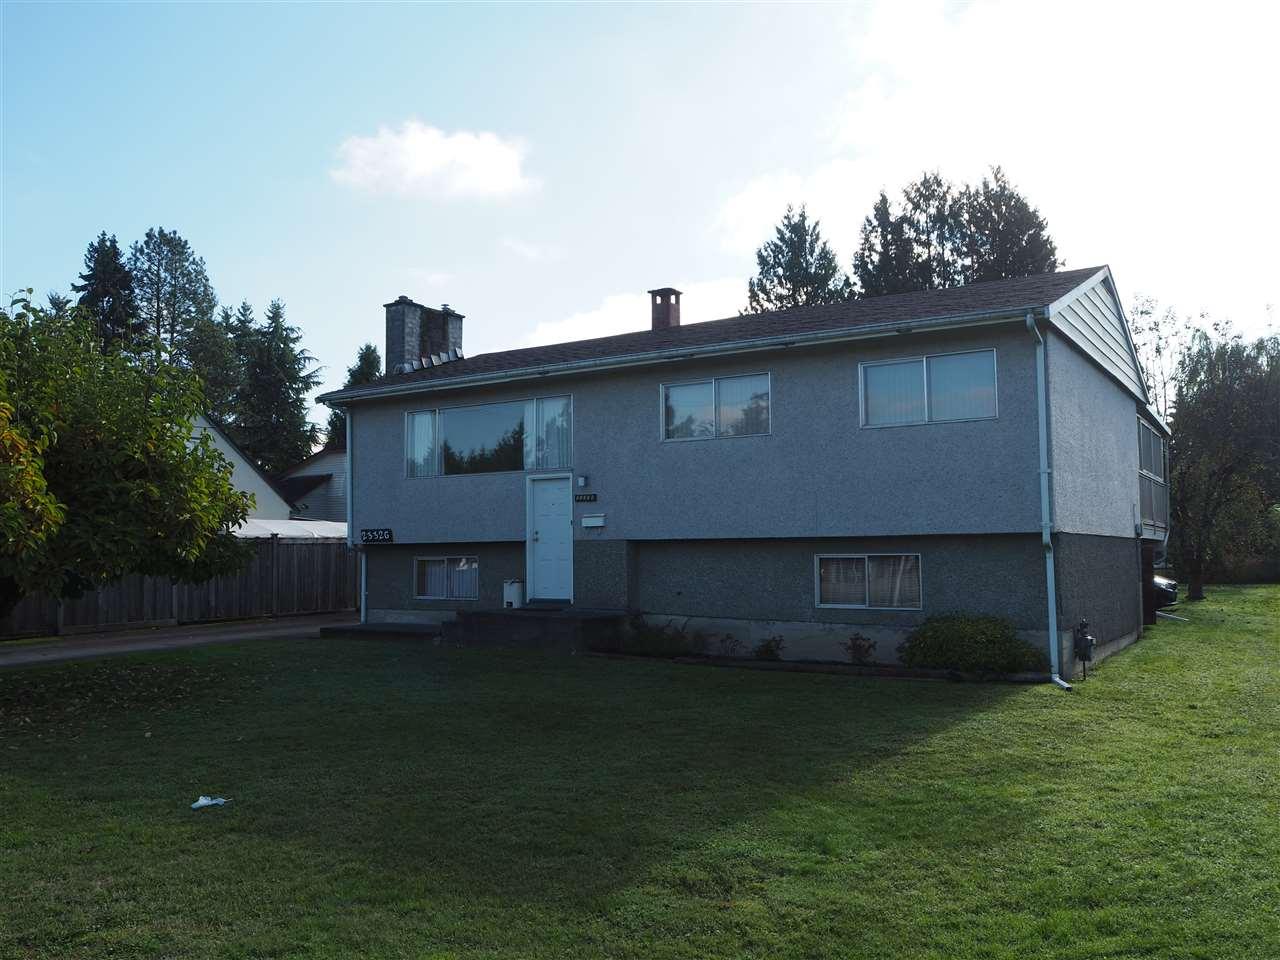 23326 DEWDNEY TRUNK ROAD, Maple Ridge, BC, V2X 3L5 Primary Photo